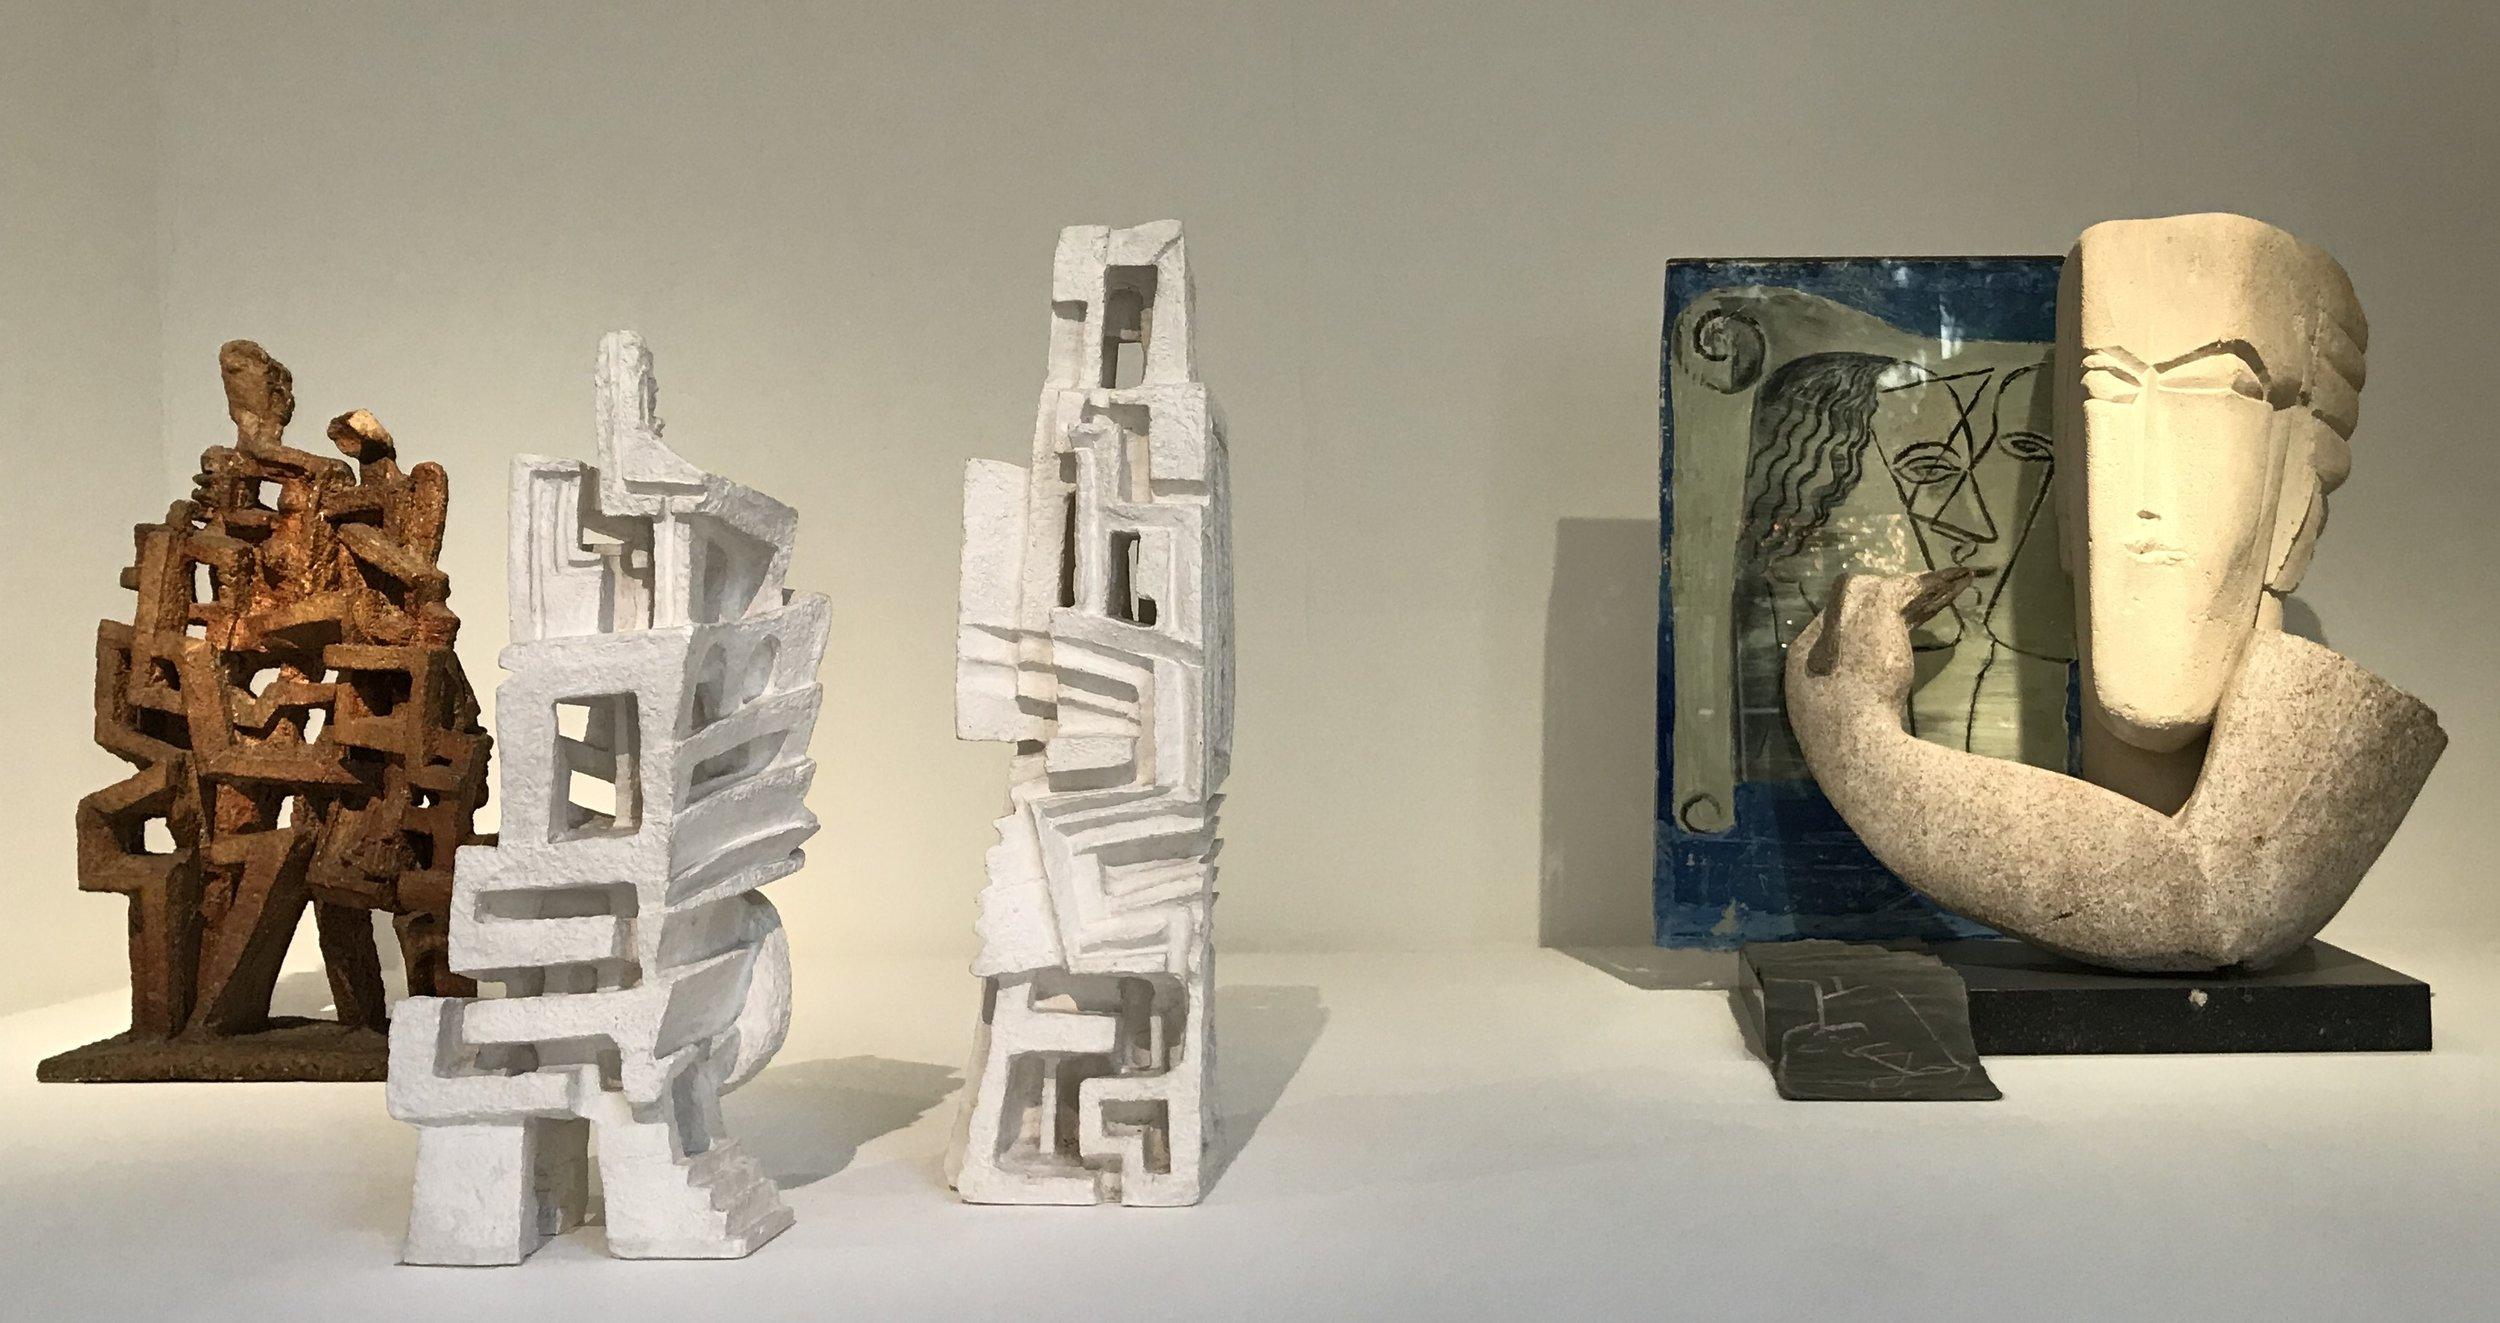 Zadkine sculptures - visiting Paris with kids